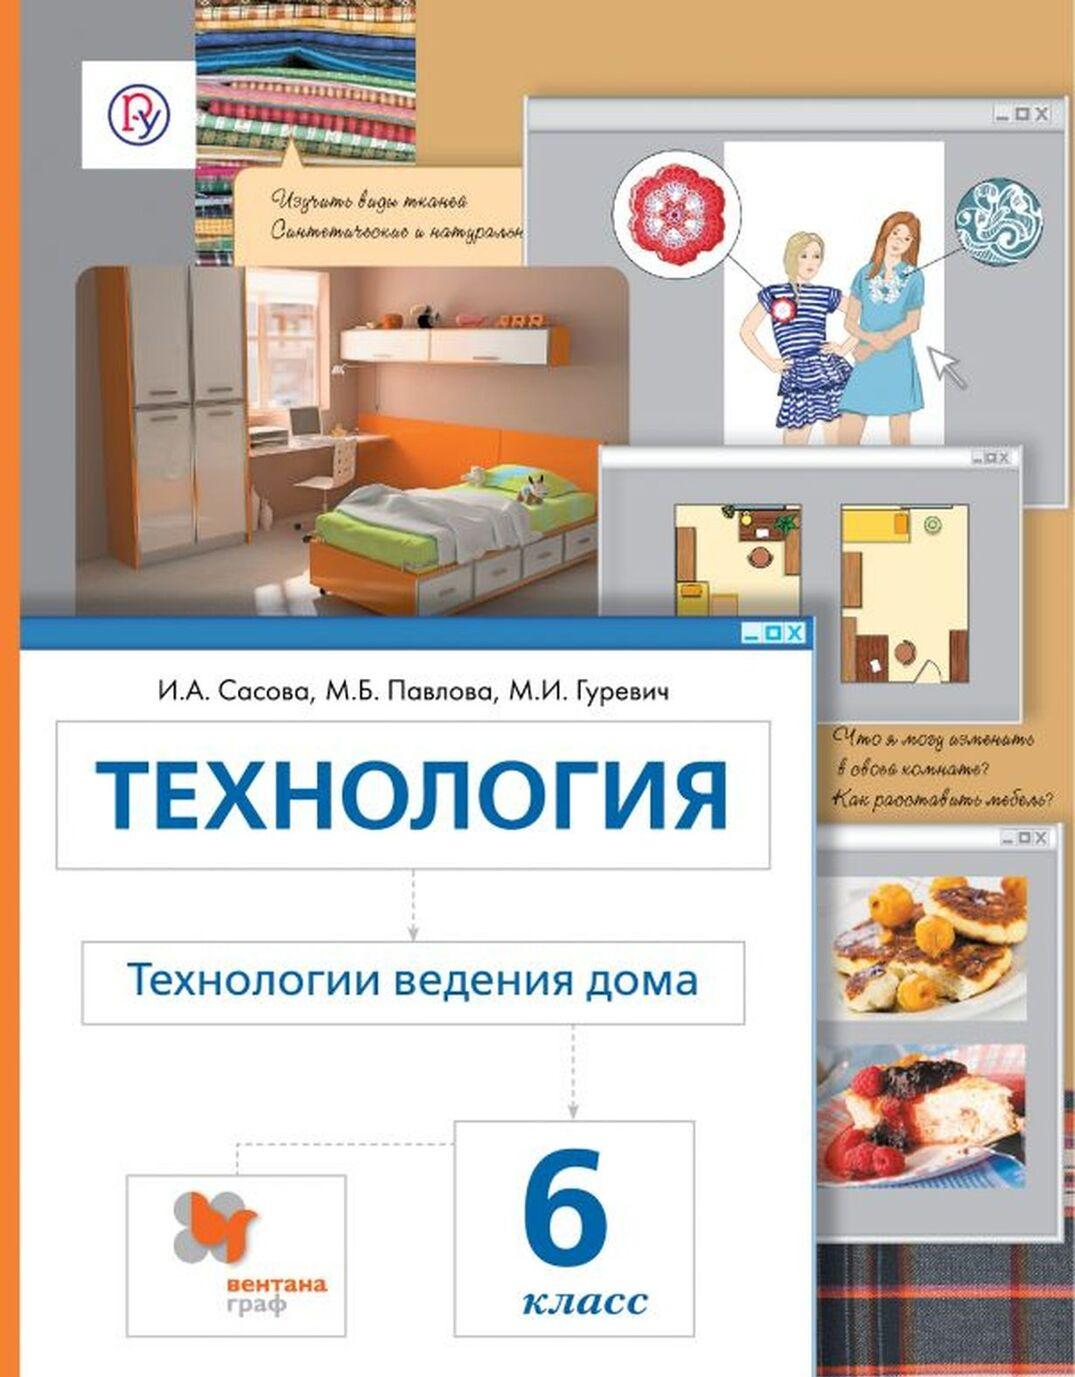 Tekhnologija. Tekhnologii vedenija doma. 6klass. Uchebnik | Sasova Irina Abramovna, Pavlova Margarita Borisovna